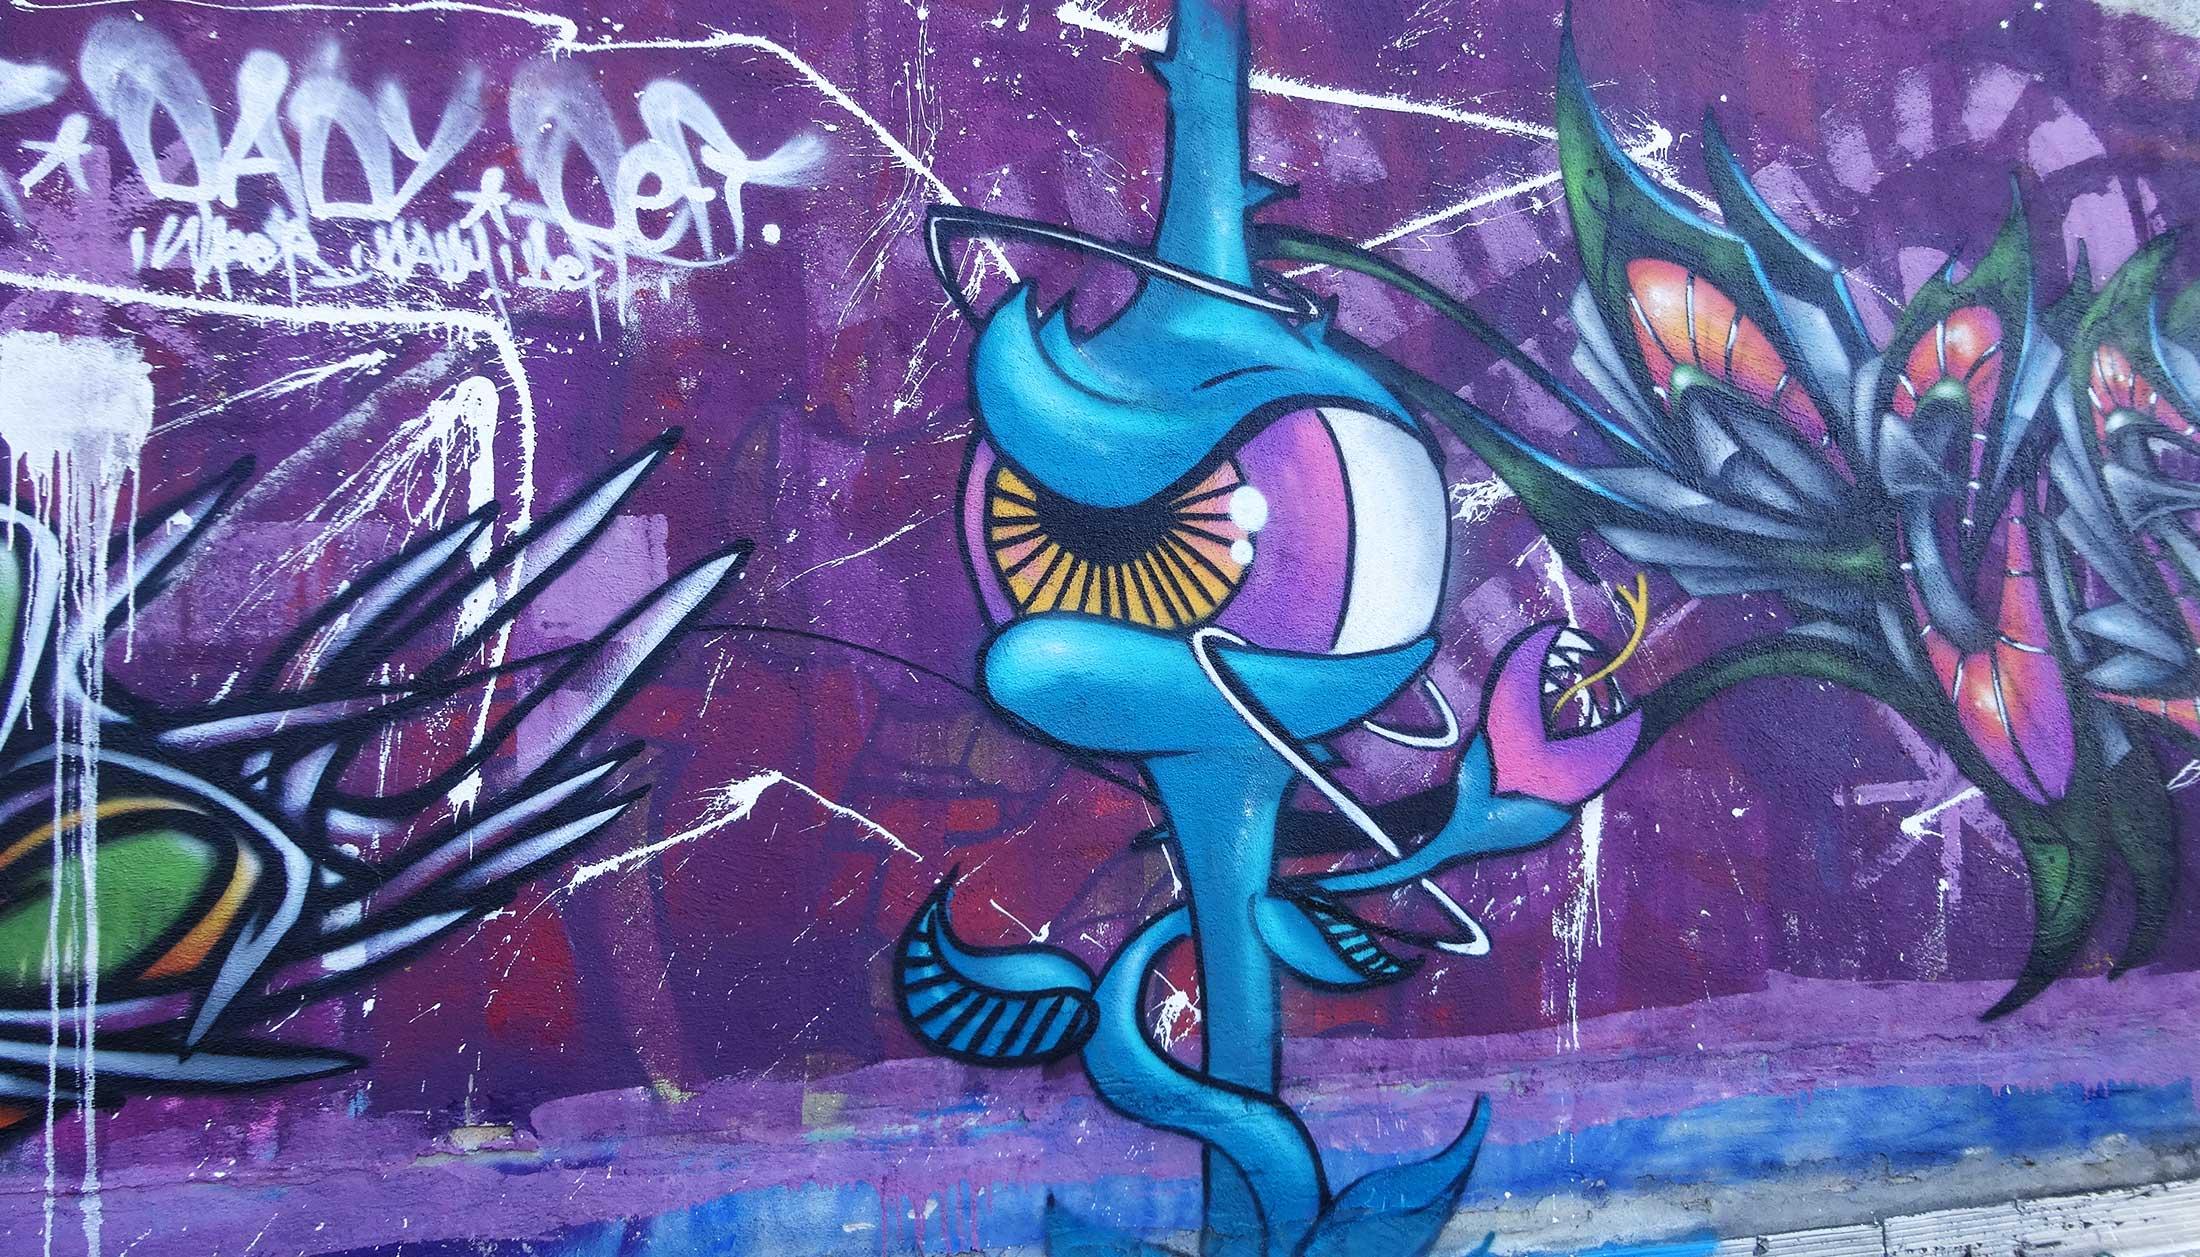 2015_04_deft_graffiti_toulouse_entrepro_ulper_dady_4_dady